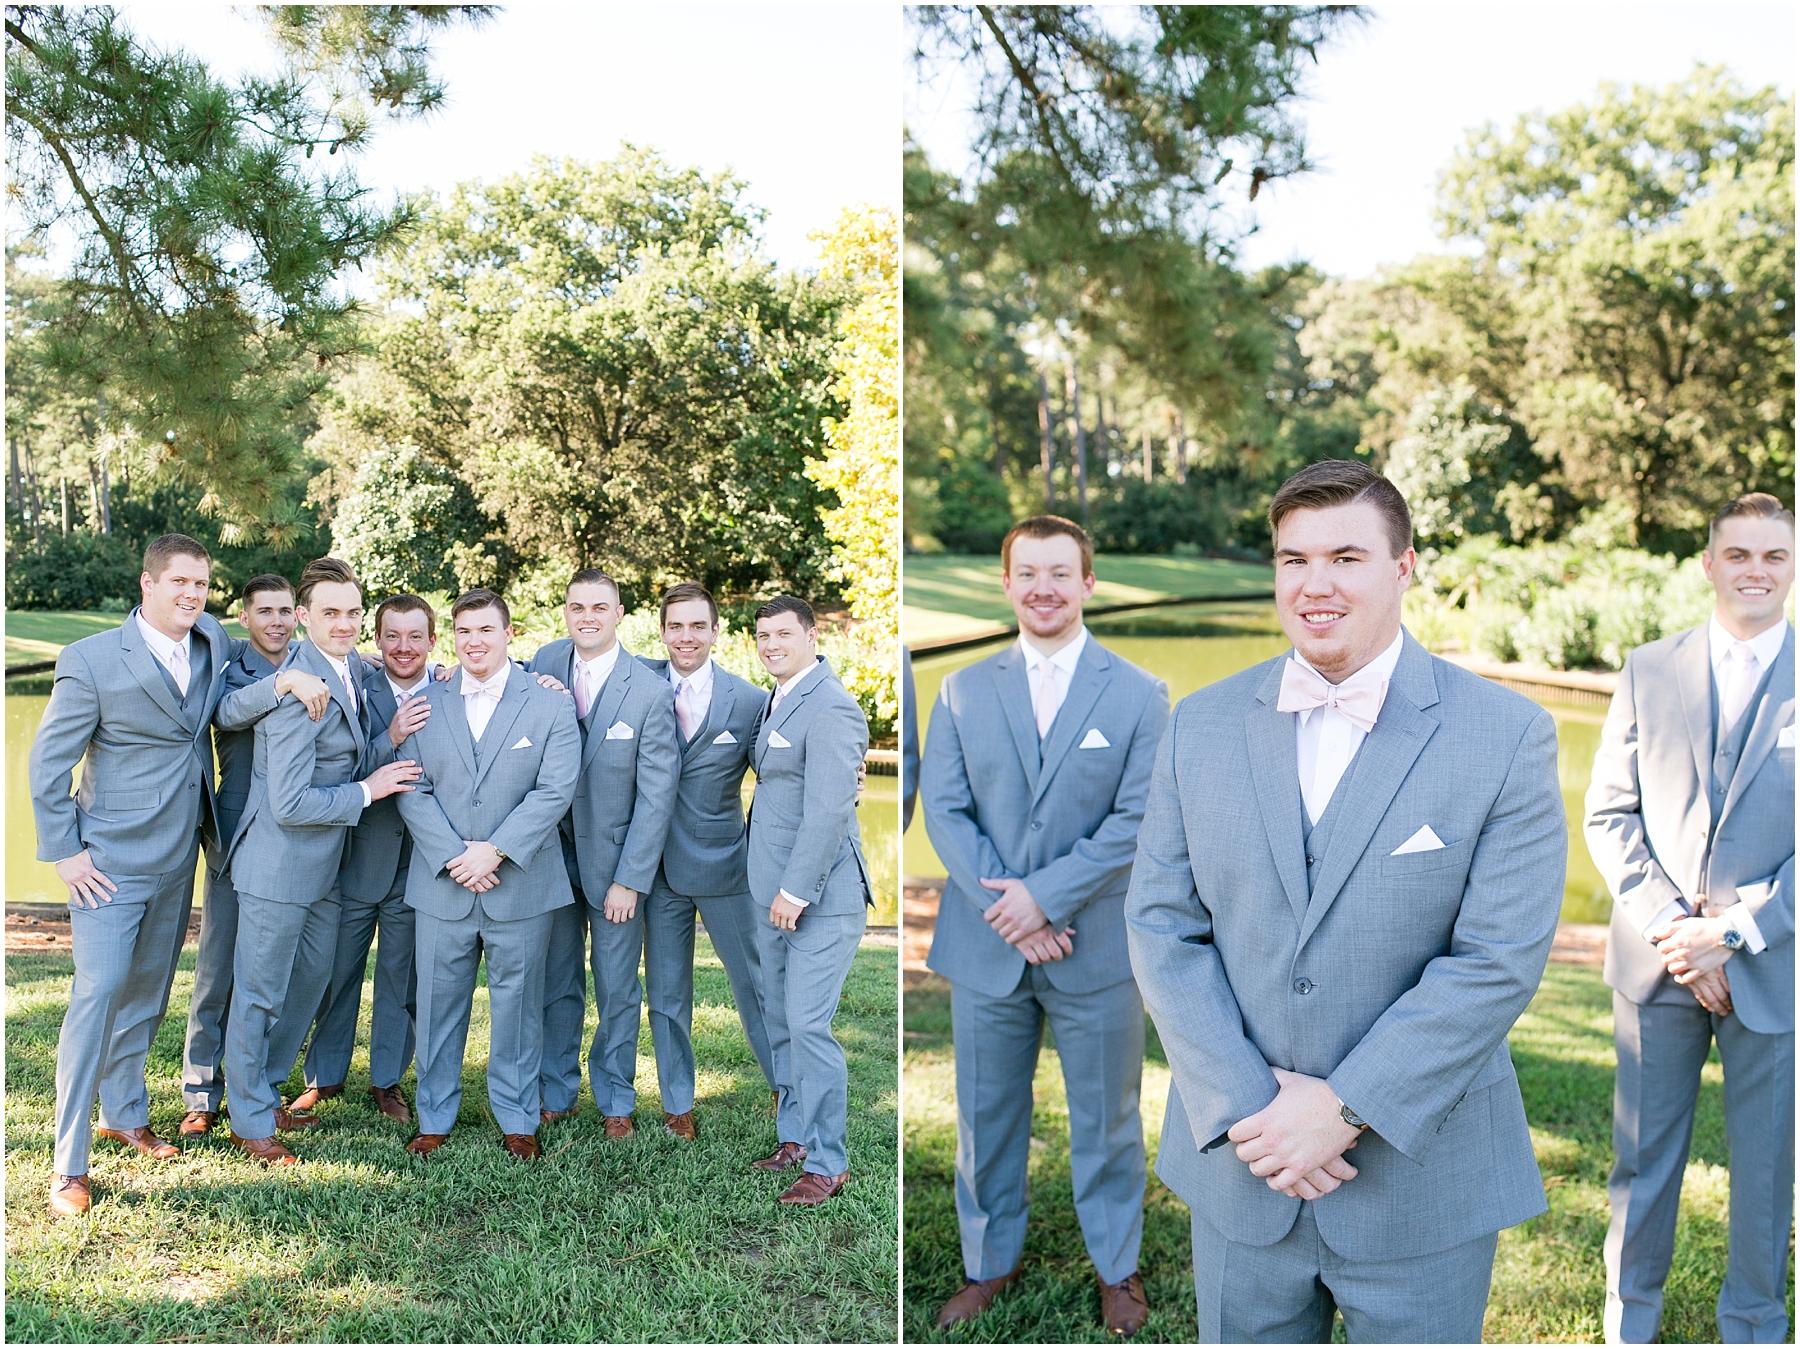 groomsmen portraits at norfolk botanical gardens wedding day, jessica ryan photography